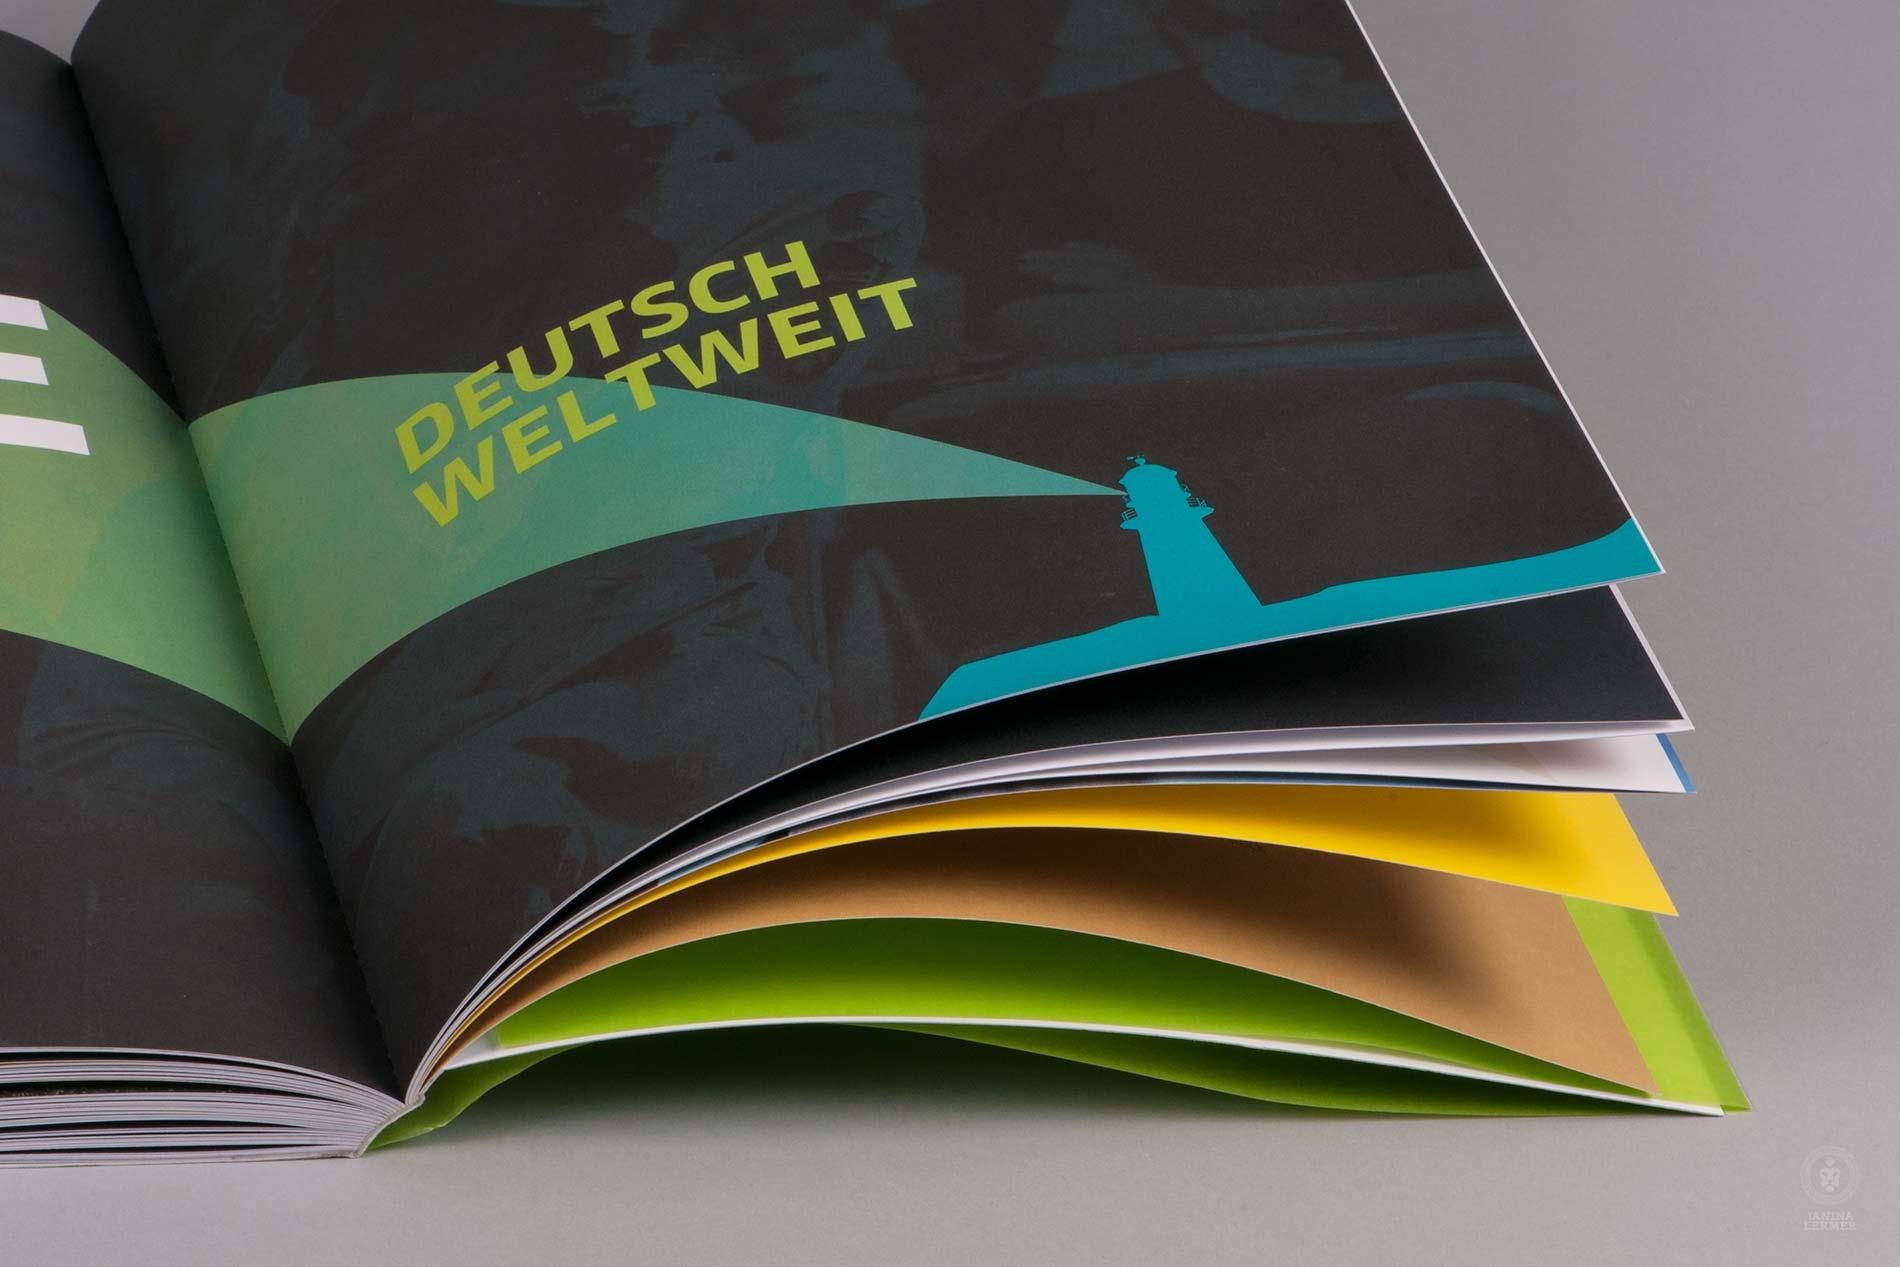 Janina-Lermer-Buchgestaltung-Magazingestaltung-Editorialdesign-Innenseite-Kapiteltrenner-2-seperatorpage-Lighthouseprojects-Goethe_Institut